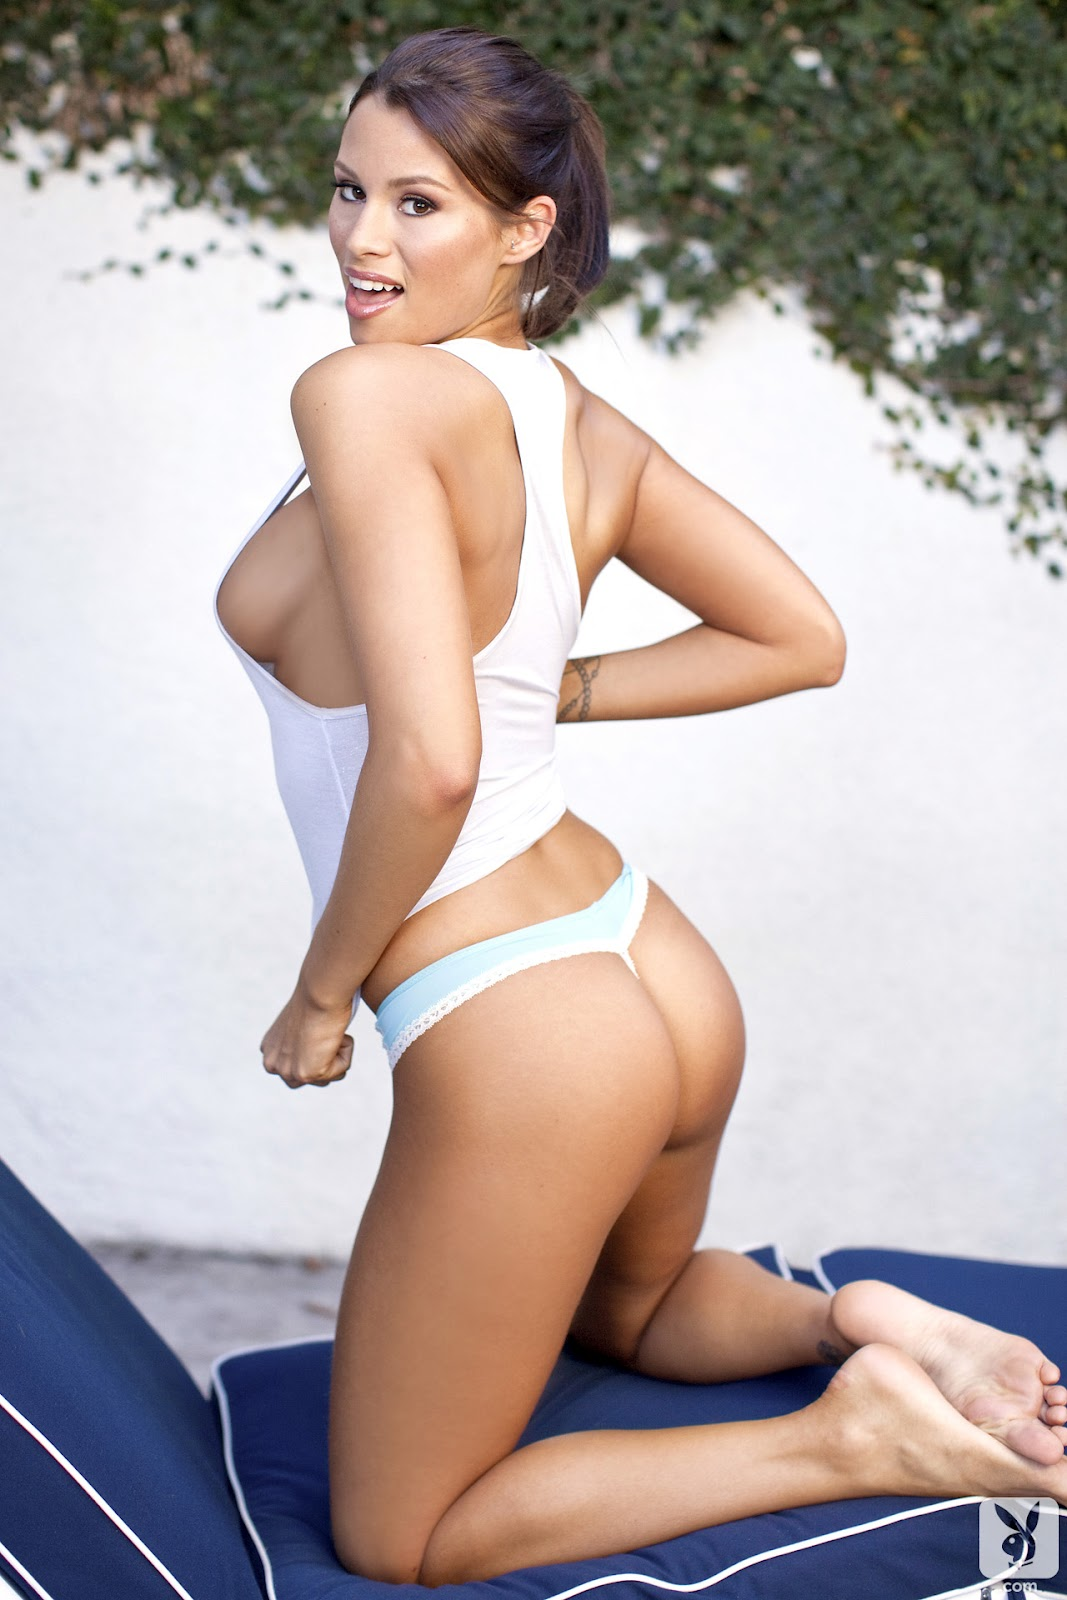 http://1.bp.blogspot.com/-c3Fn4982oFM/T9CaNdw85iI/AAAAAAAAM-g/xN-SyDHhL-I/s1600/CHRISTINA+RENEE+-+TINY+DANCERC+(19).jpg